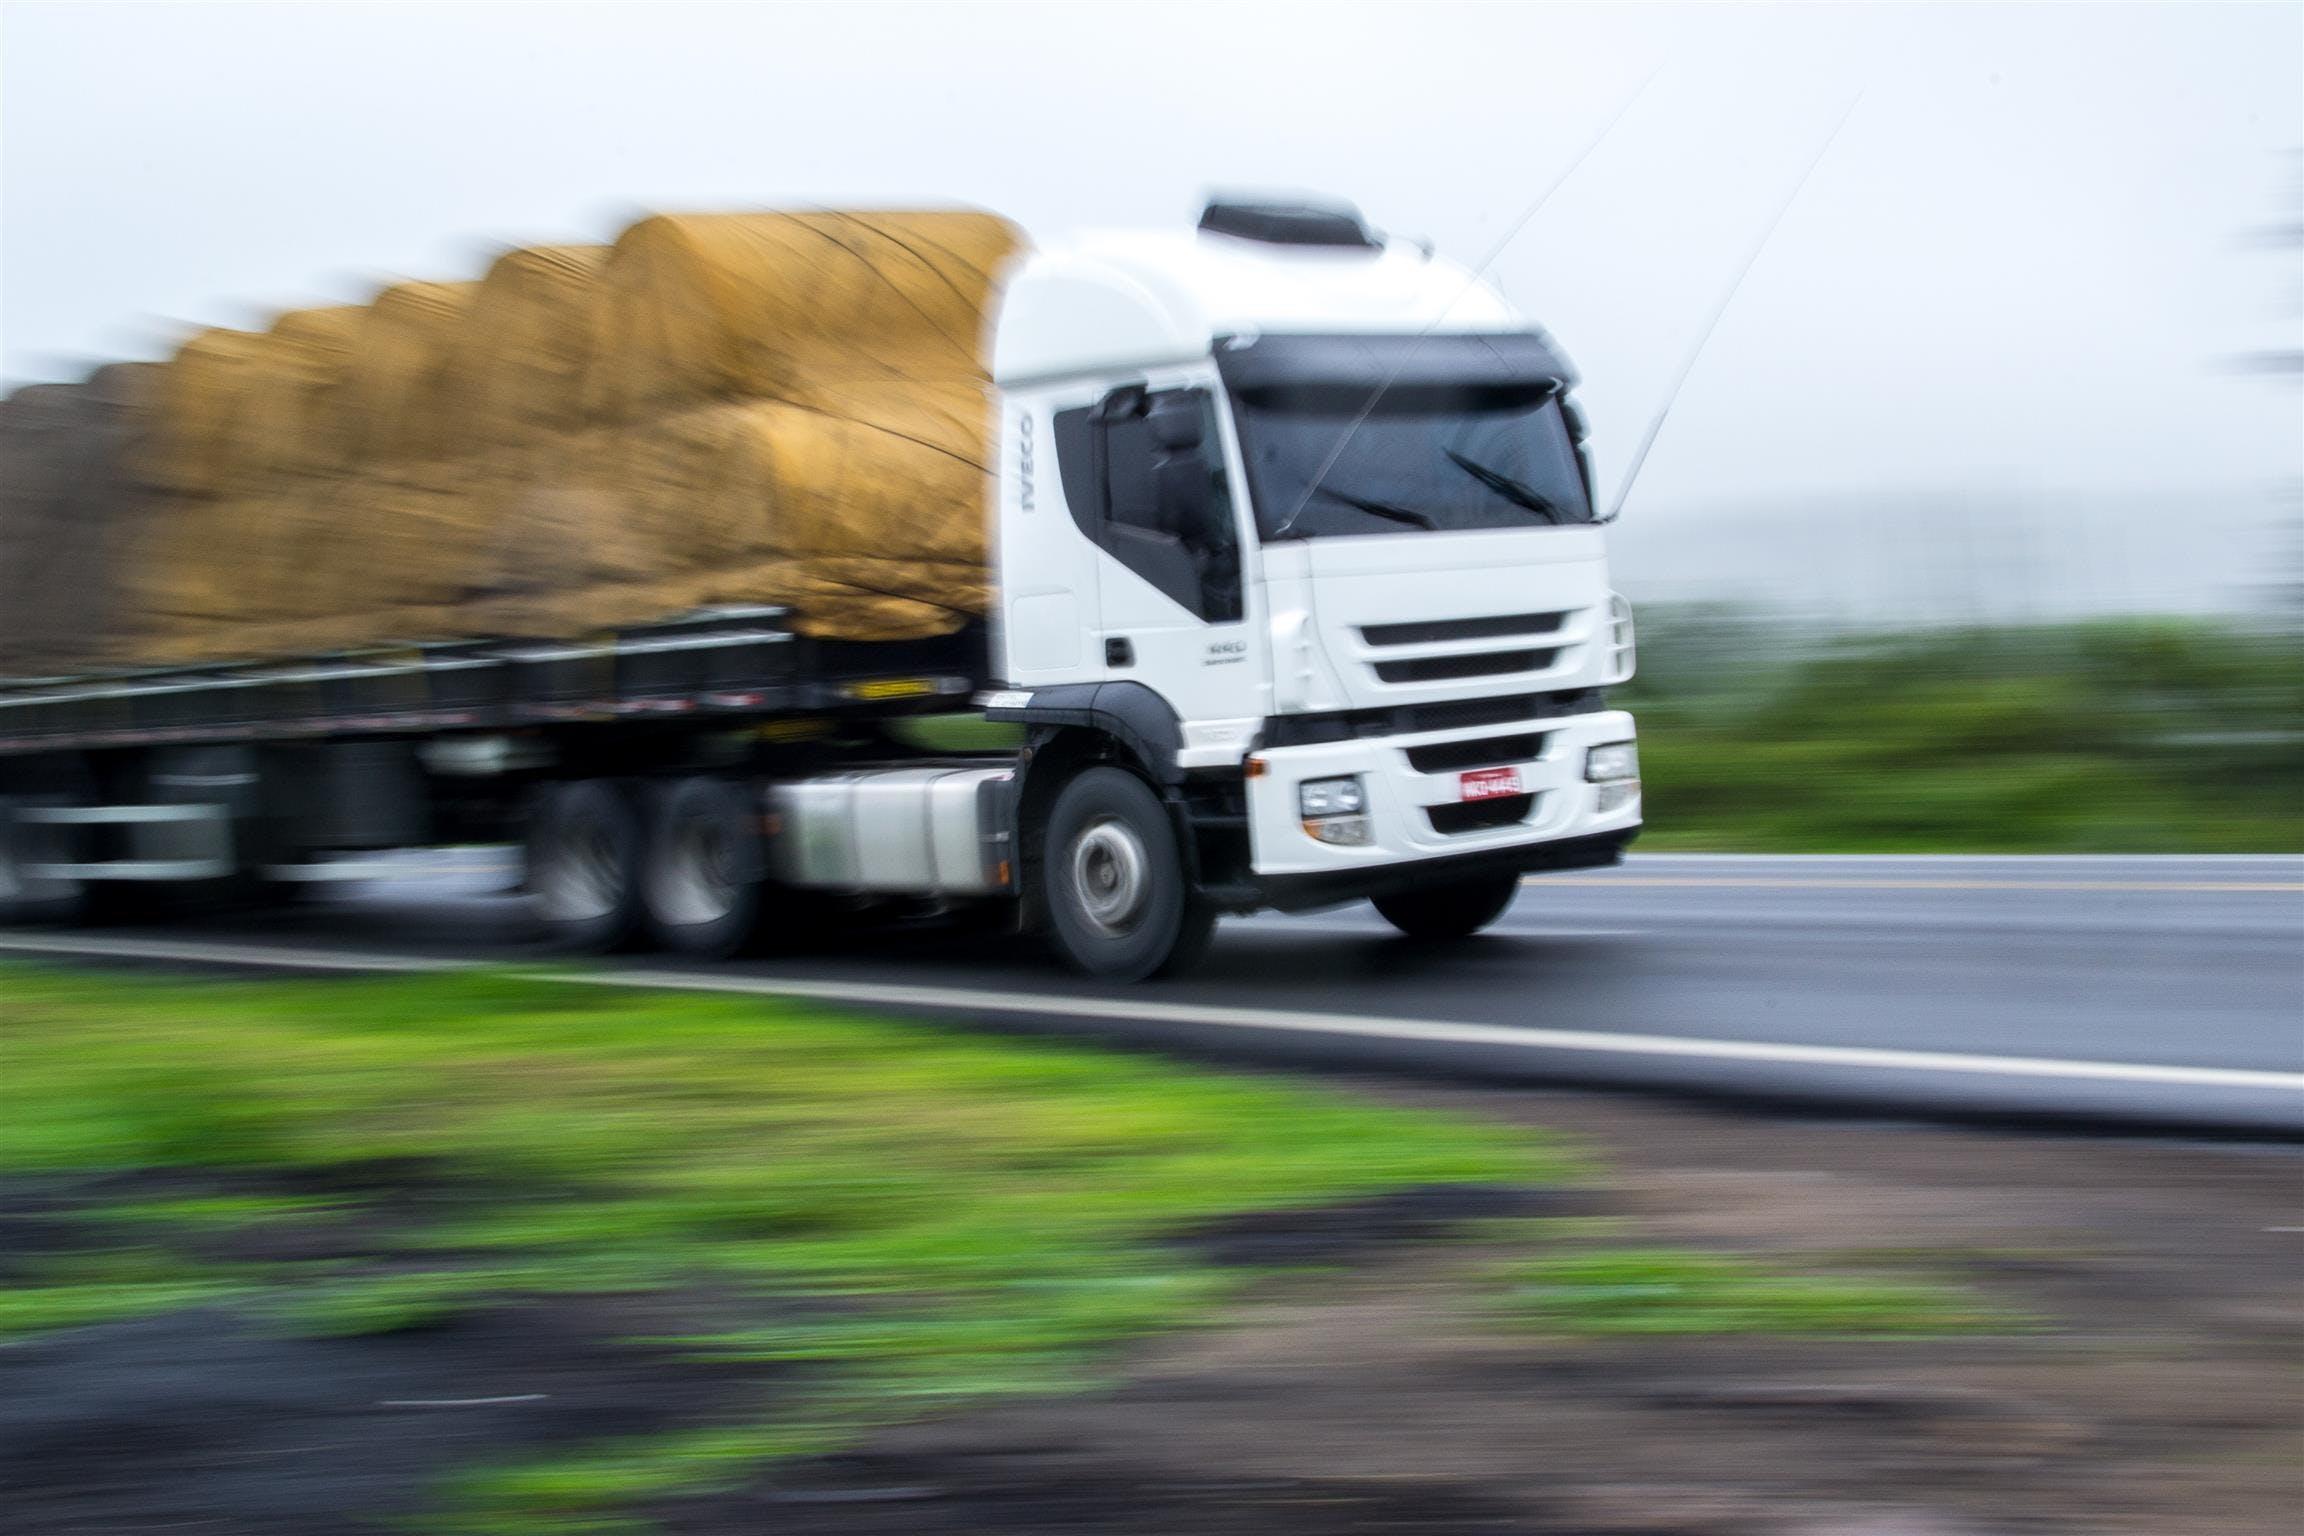 Free stock photo of highway, truck, nikon, 35mm